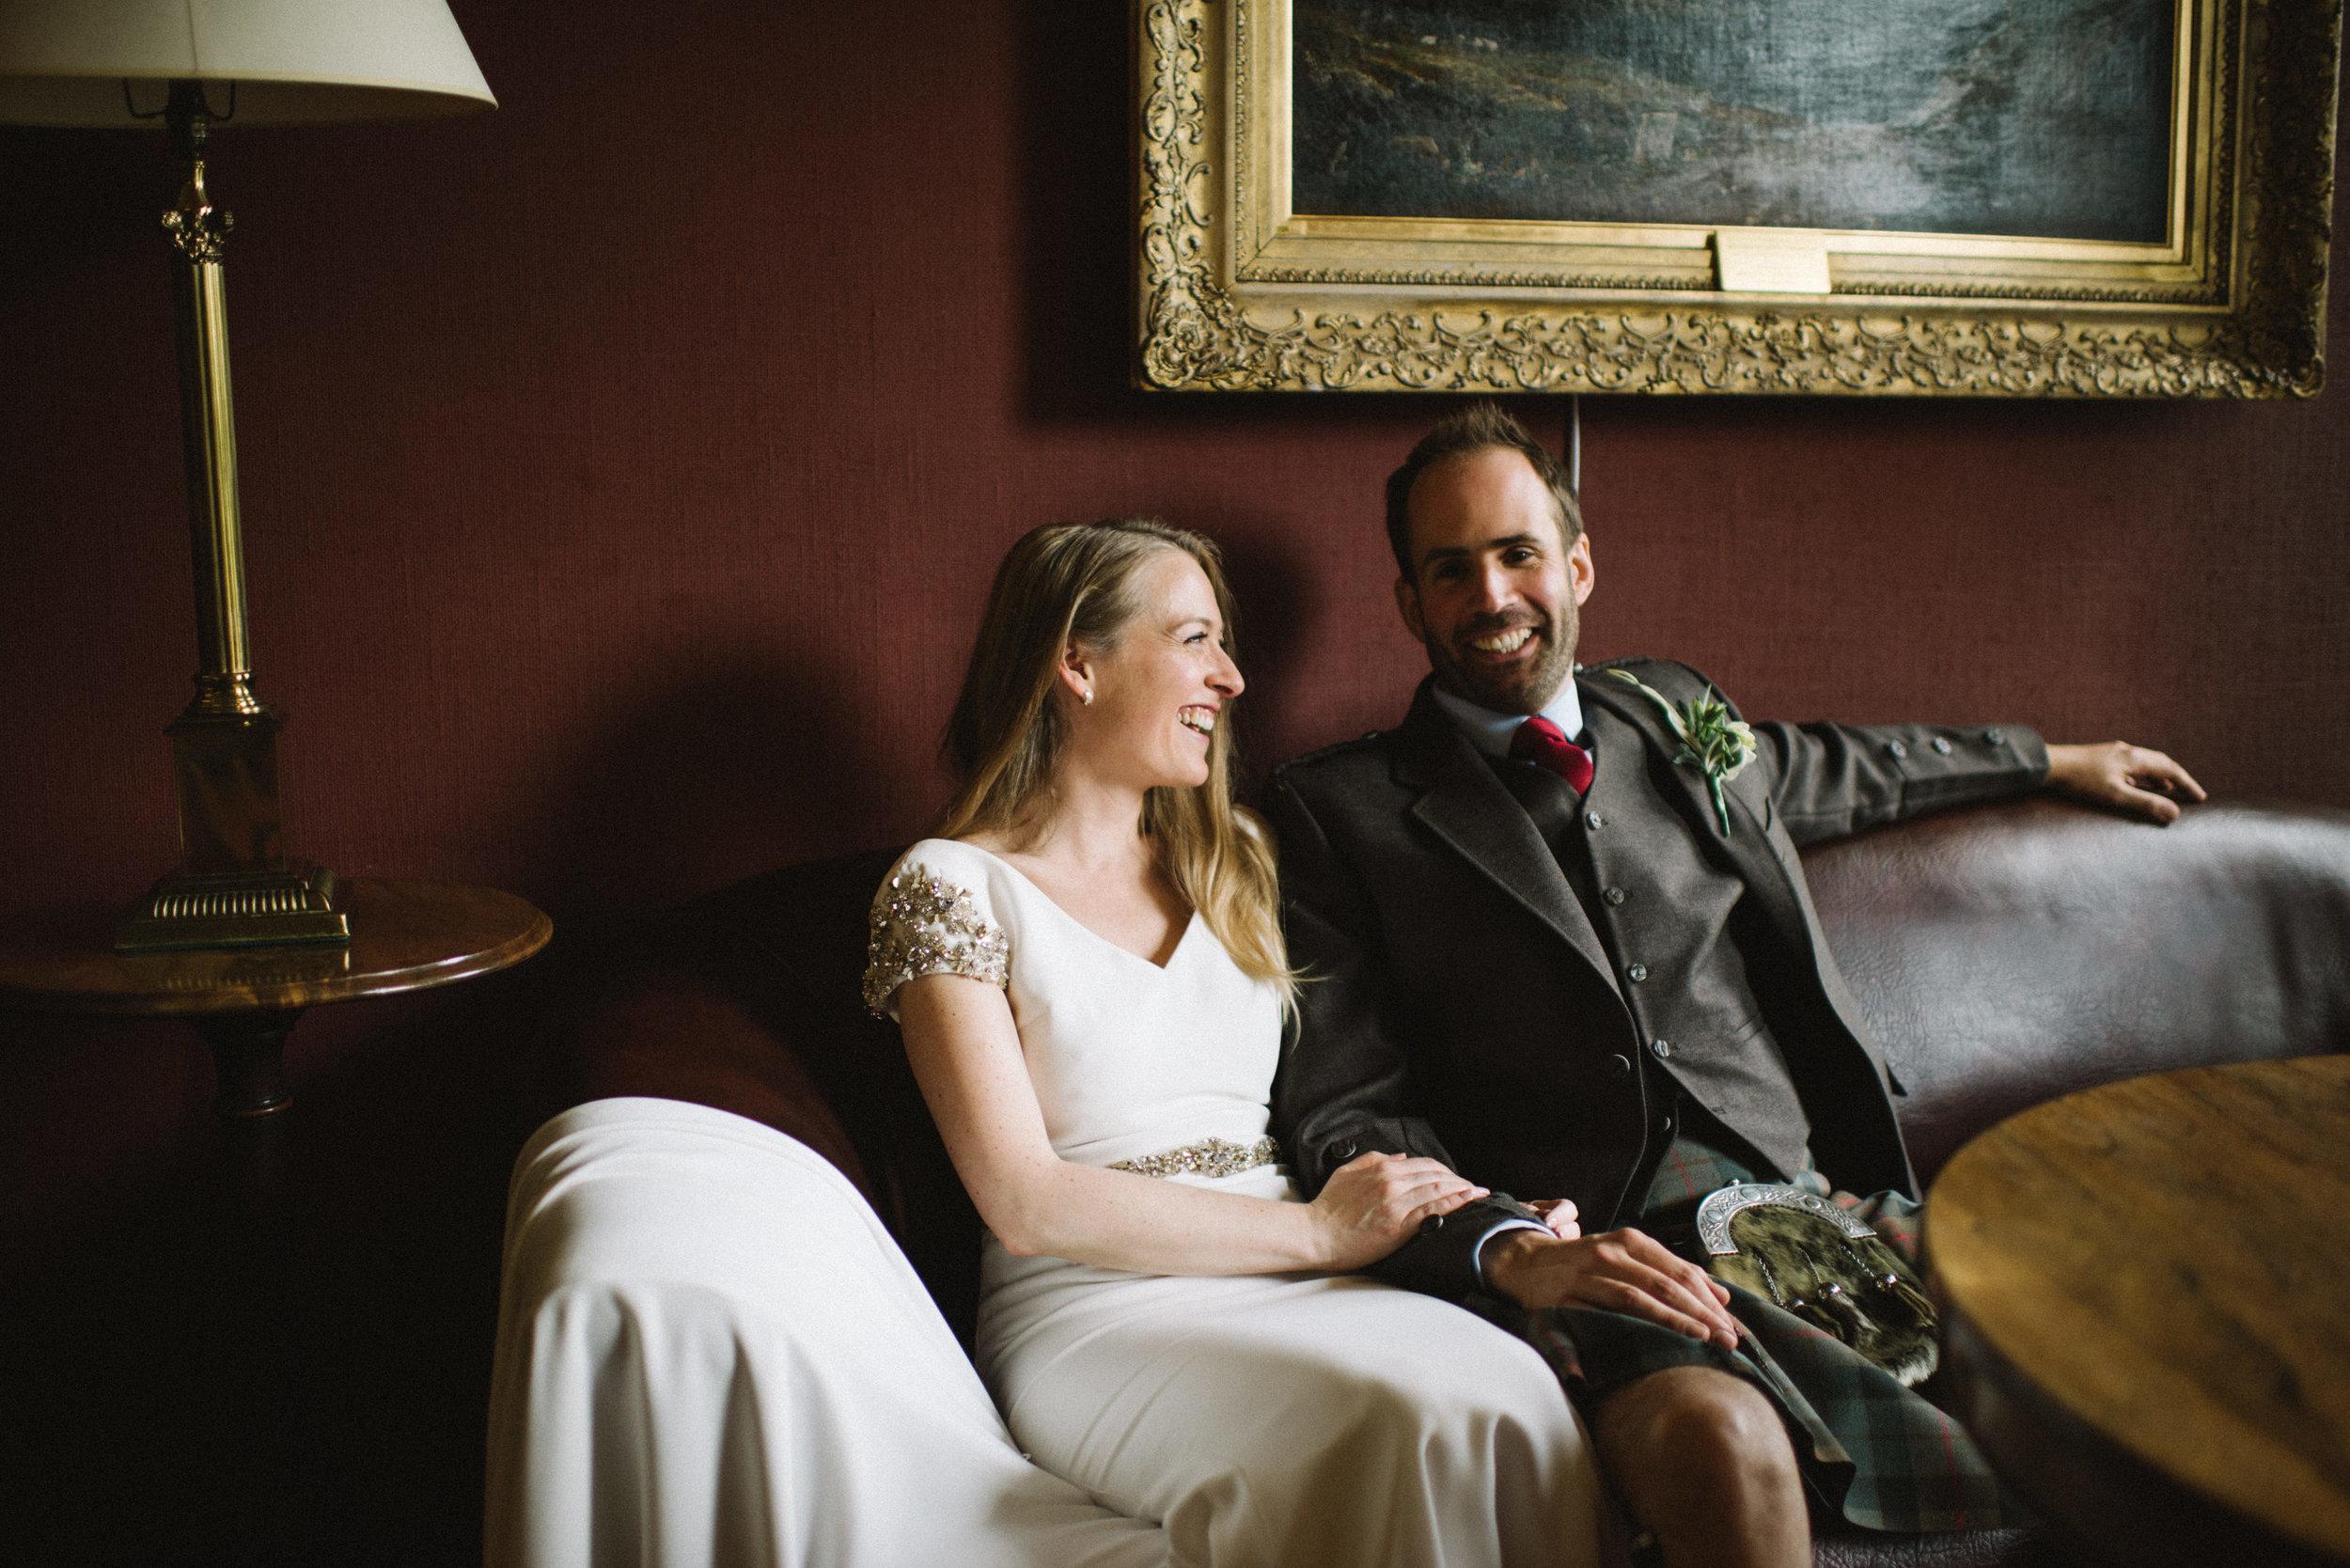 0091-LISA-DEVINE-PHOTOGRAPHY-ALTERNATIVE-WEDDING-PHOTOGRAPHY-SCOTLAND-DESTINATION-WEDDINGS-GLASGOW-WEDDINGS-COOL-WEDDINGS-STYLISH-WEDDINGS.JPG